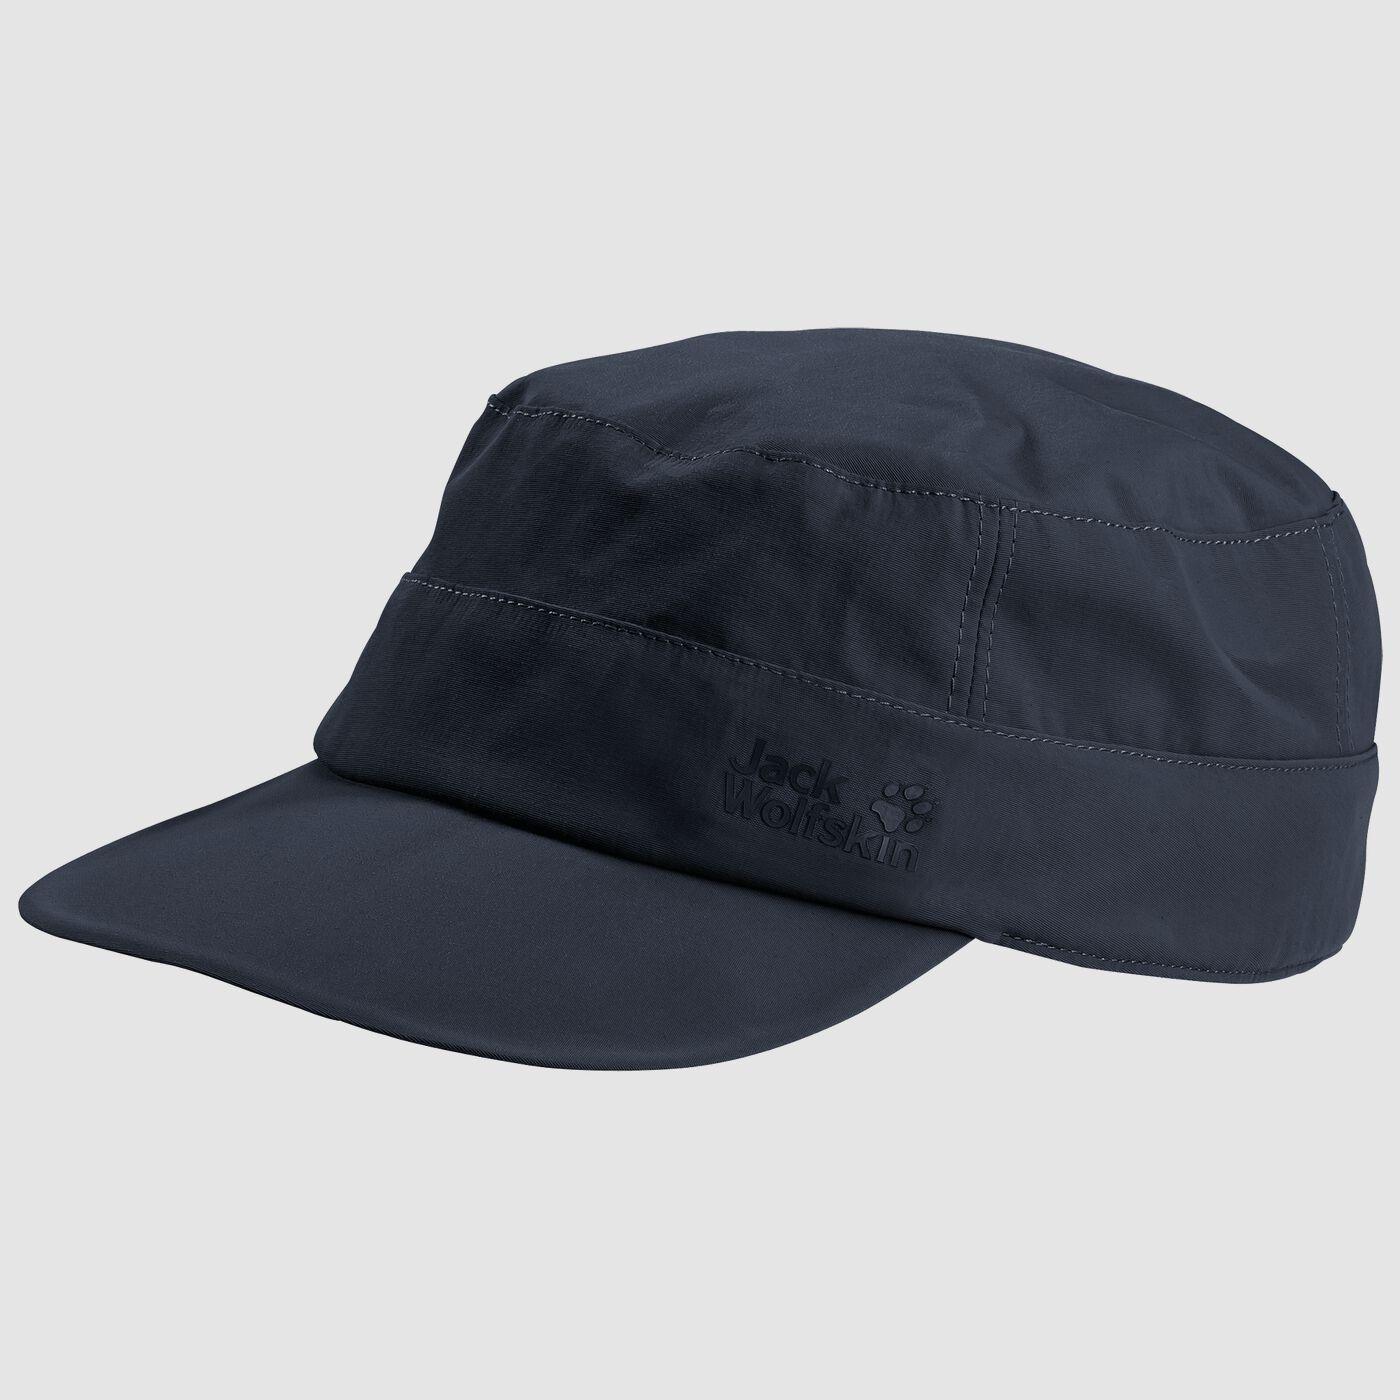 SUPPLEX BAHIA CAP KIDS